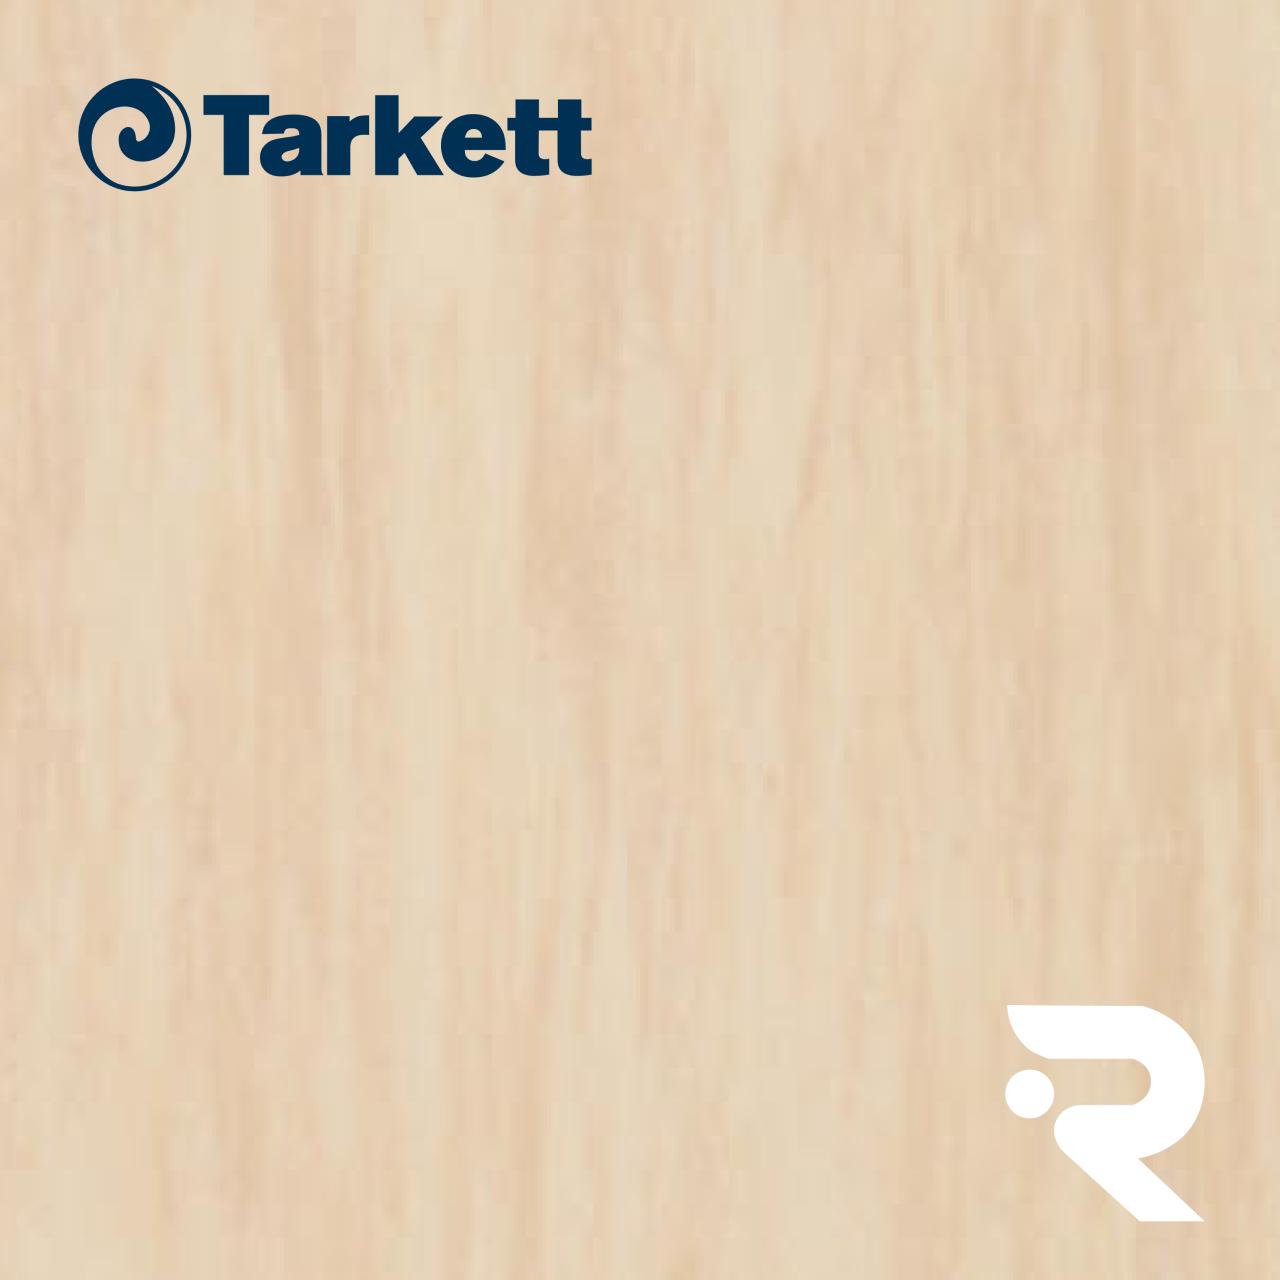 🏫 Гомогенный линолеум Tarkett | Standard SAND 0913 | Standard Plus 2.0 mm | 2 х 23 м